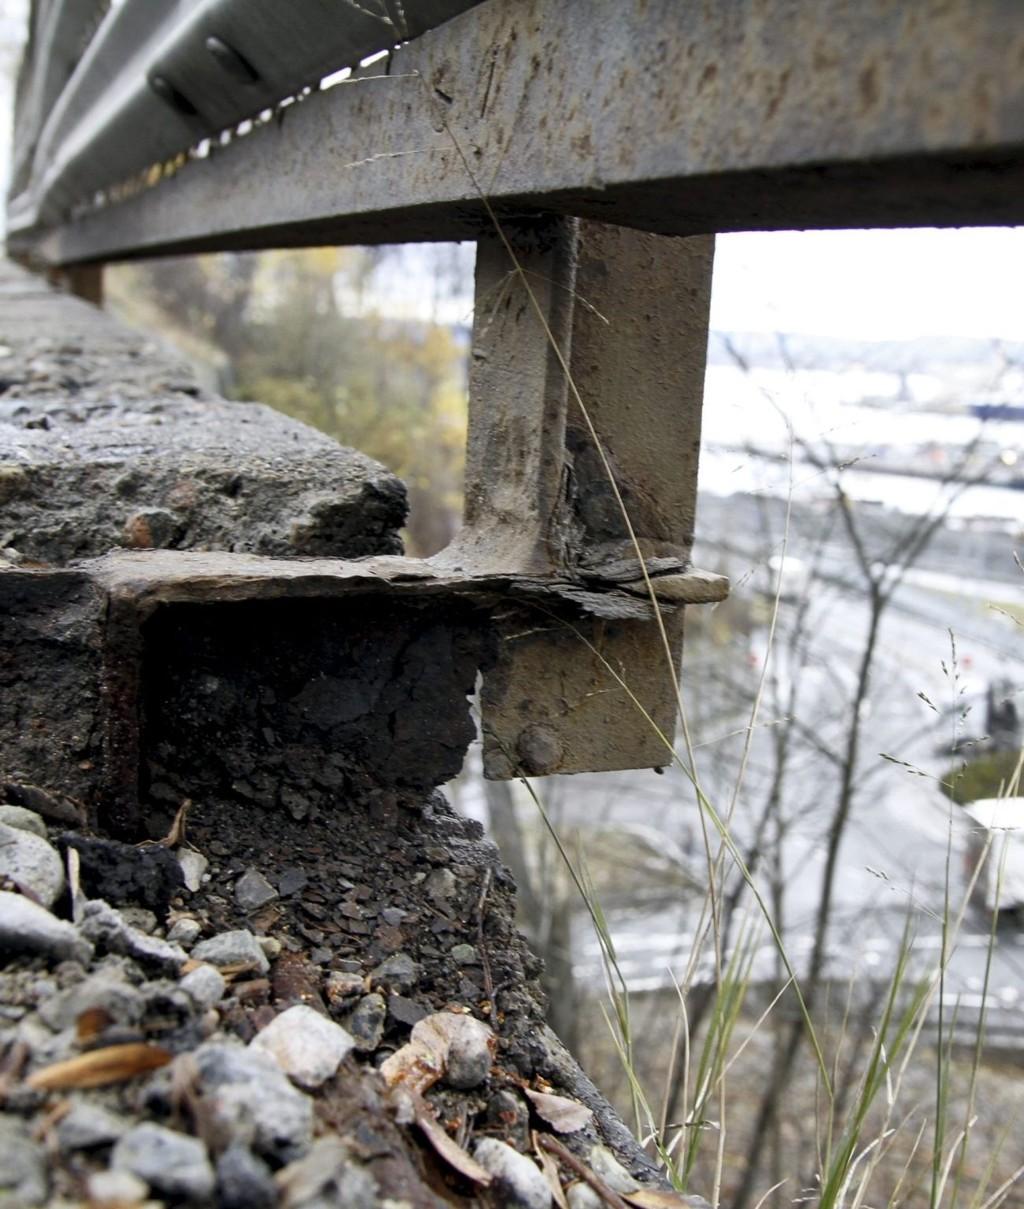 REAGERER: NAF og Arnulf Ingulstad ber Bymiljøetaten utbedre rekkverket i Kongsveien. FOTO: ØYSTEIN DAHL JOHANSEN